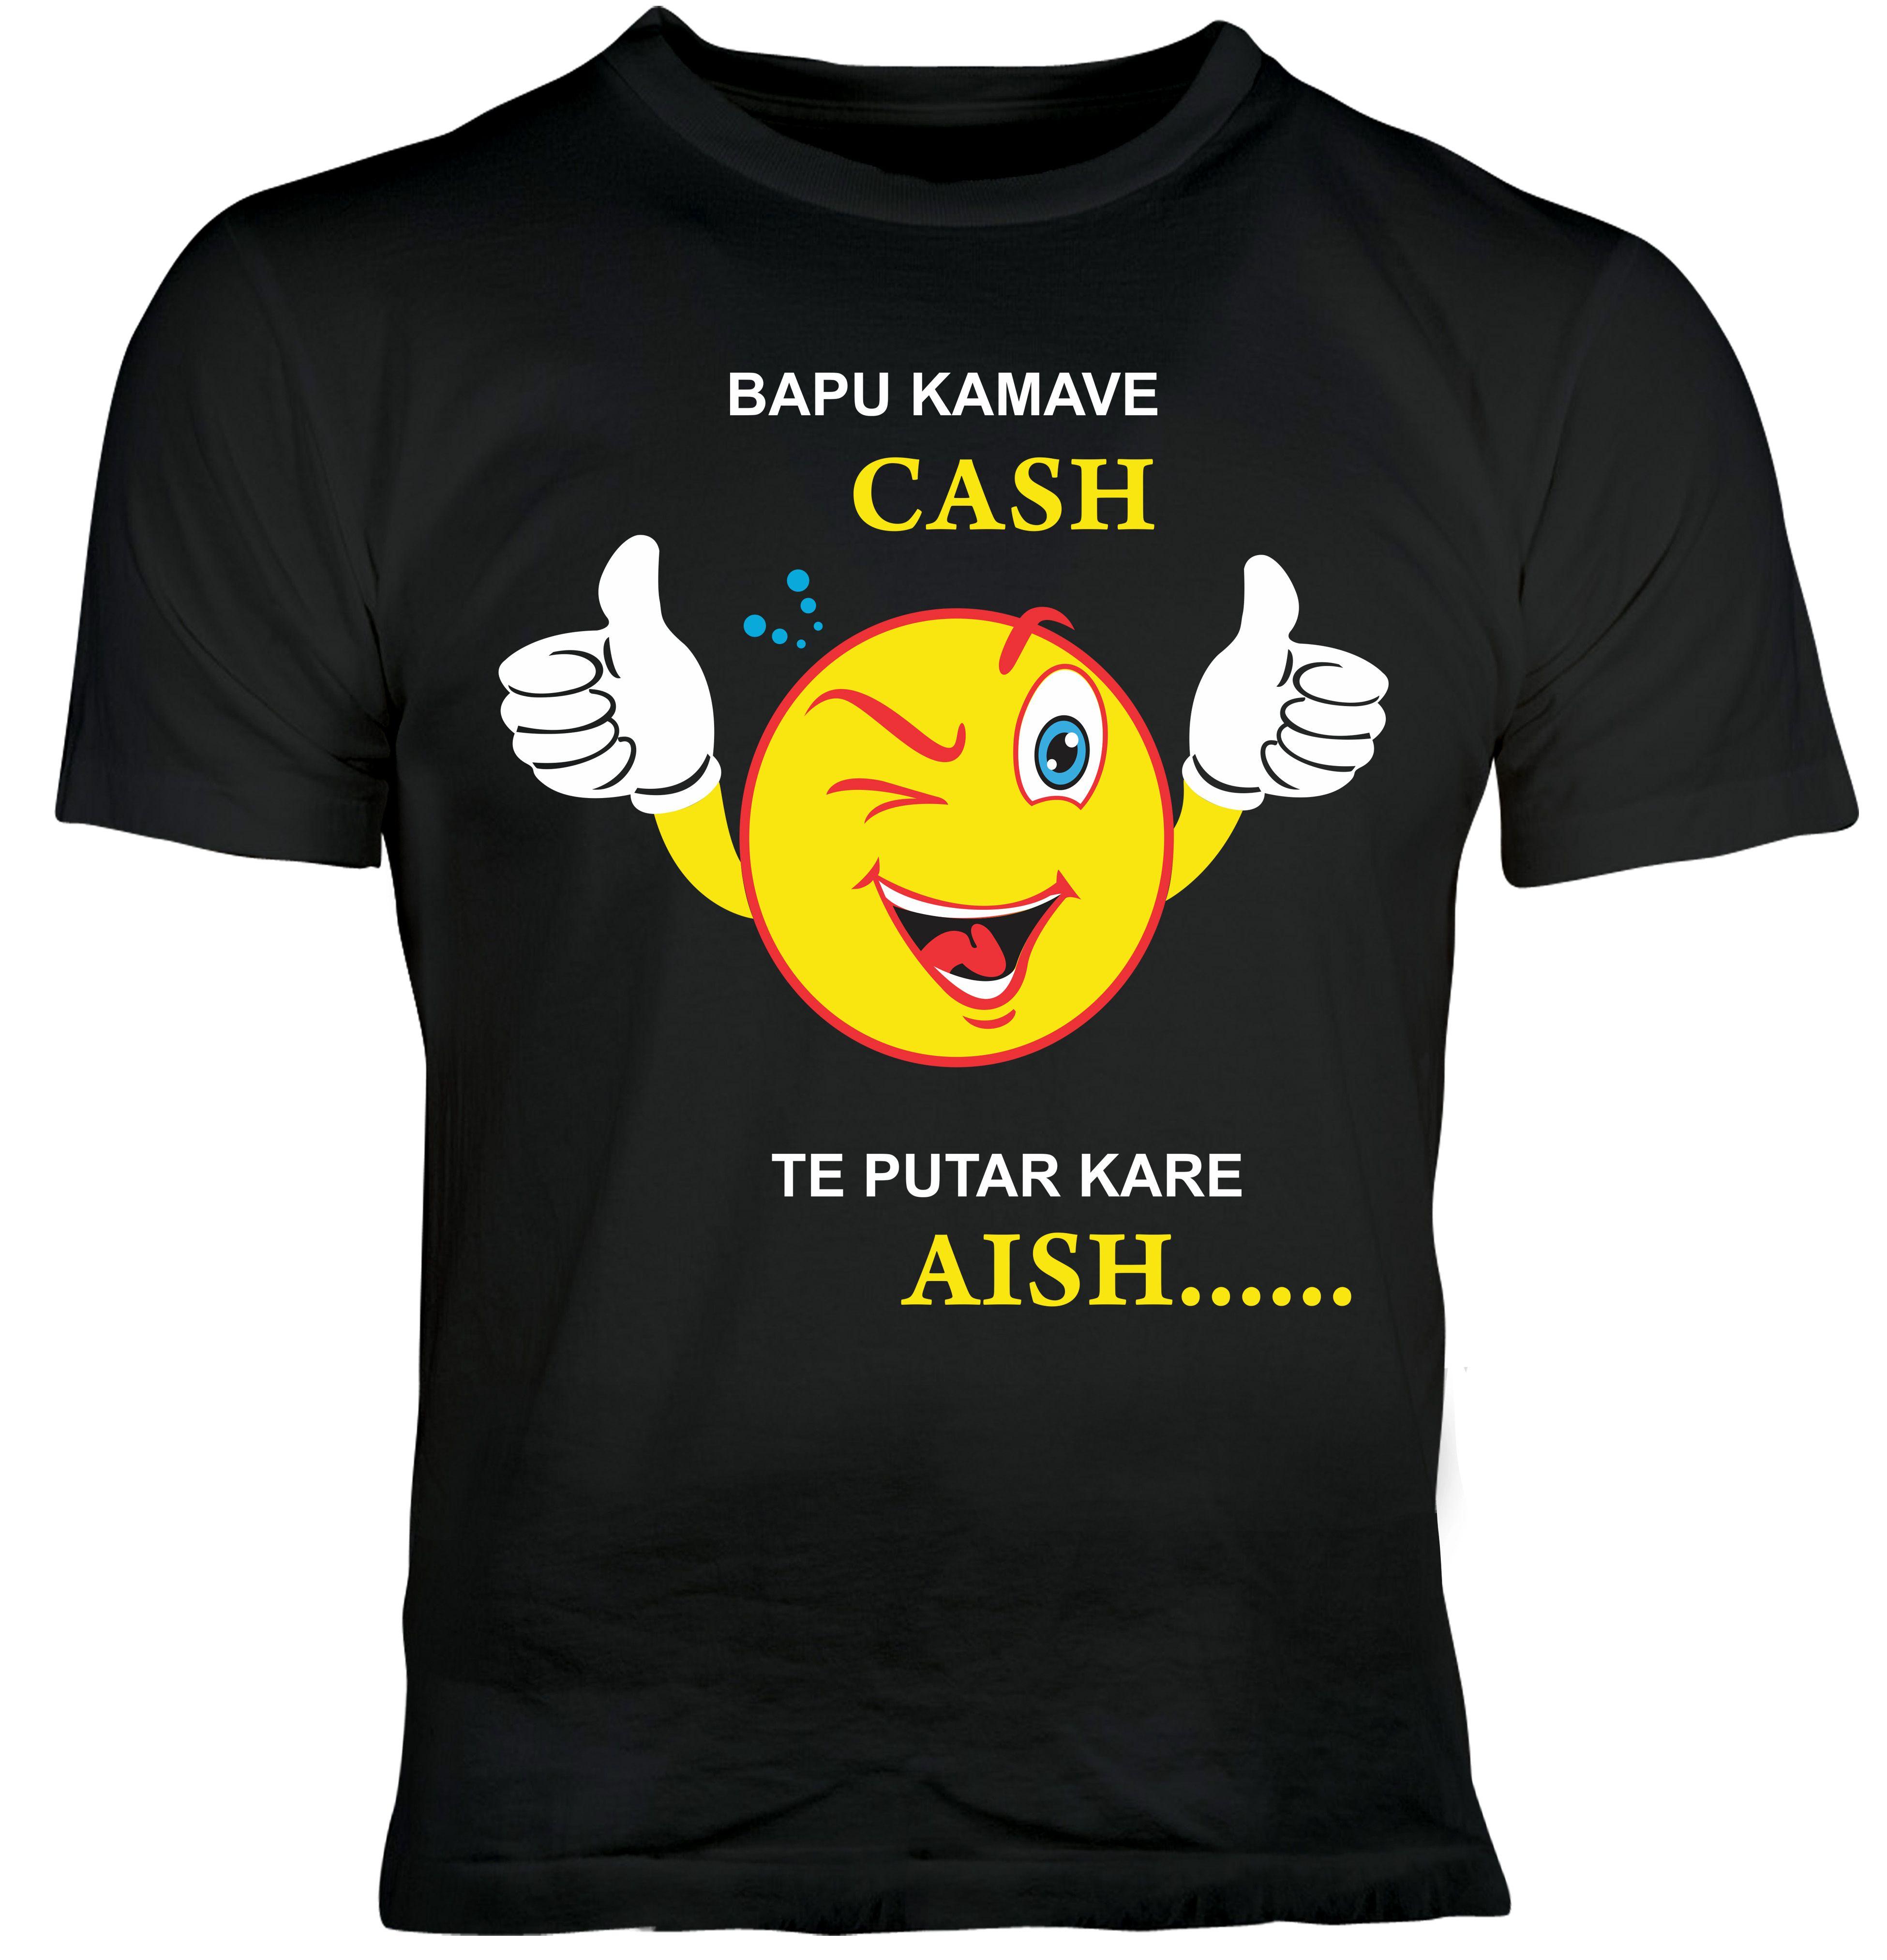 Buy Oneliner Mens Black T Shirt Printed Bapu Kamave Cash With Icon